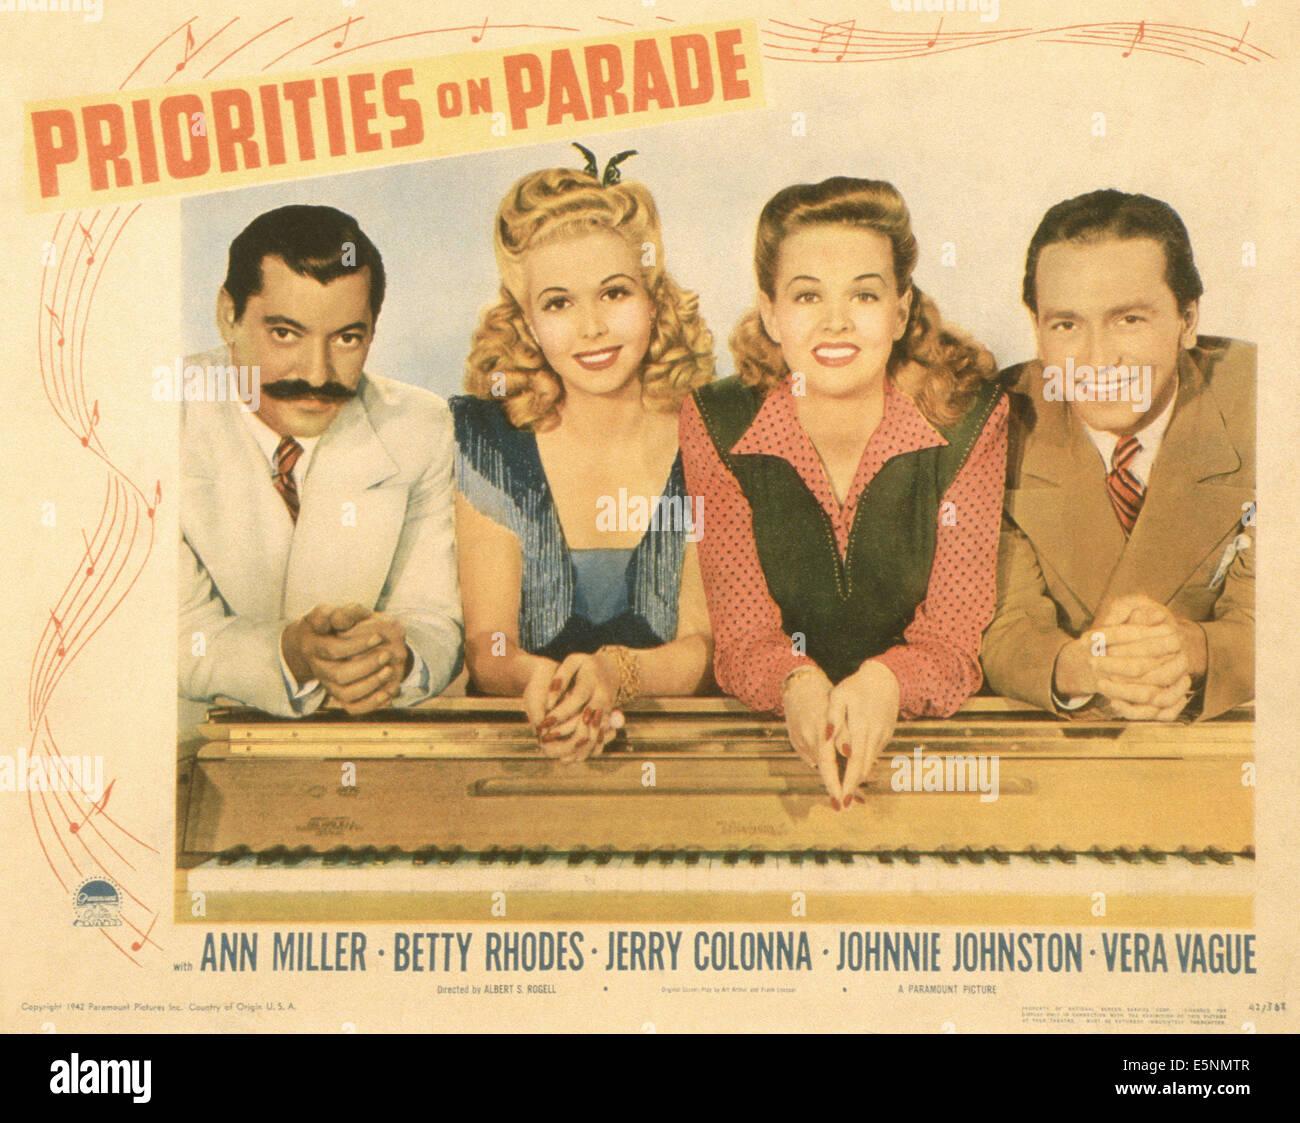 Anthony Valentine (1939?015),Carole Mathews Hot video Marc Warren (born 1967),Irene Ryan